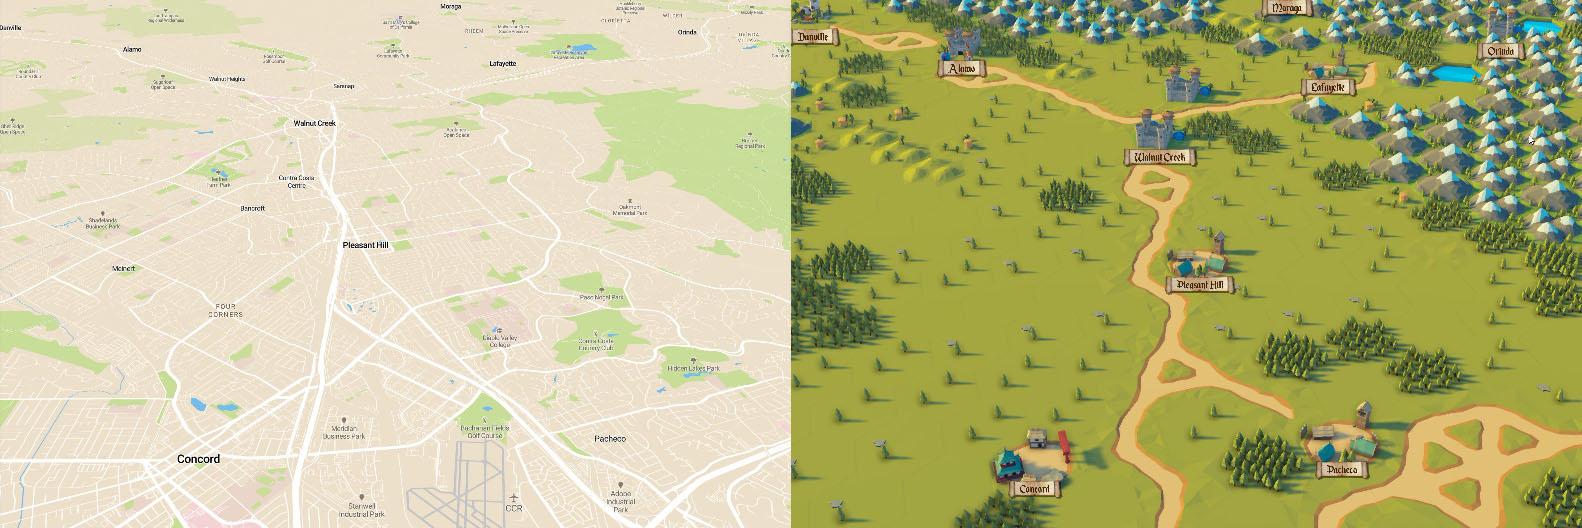 Tiled Maps using Mapbox | brnkhy - Unity3D Game Development